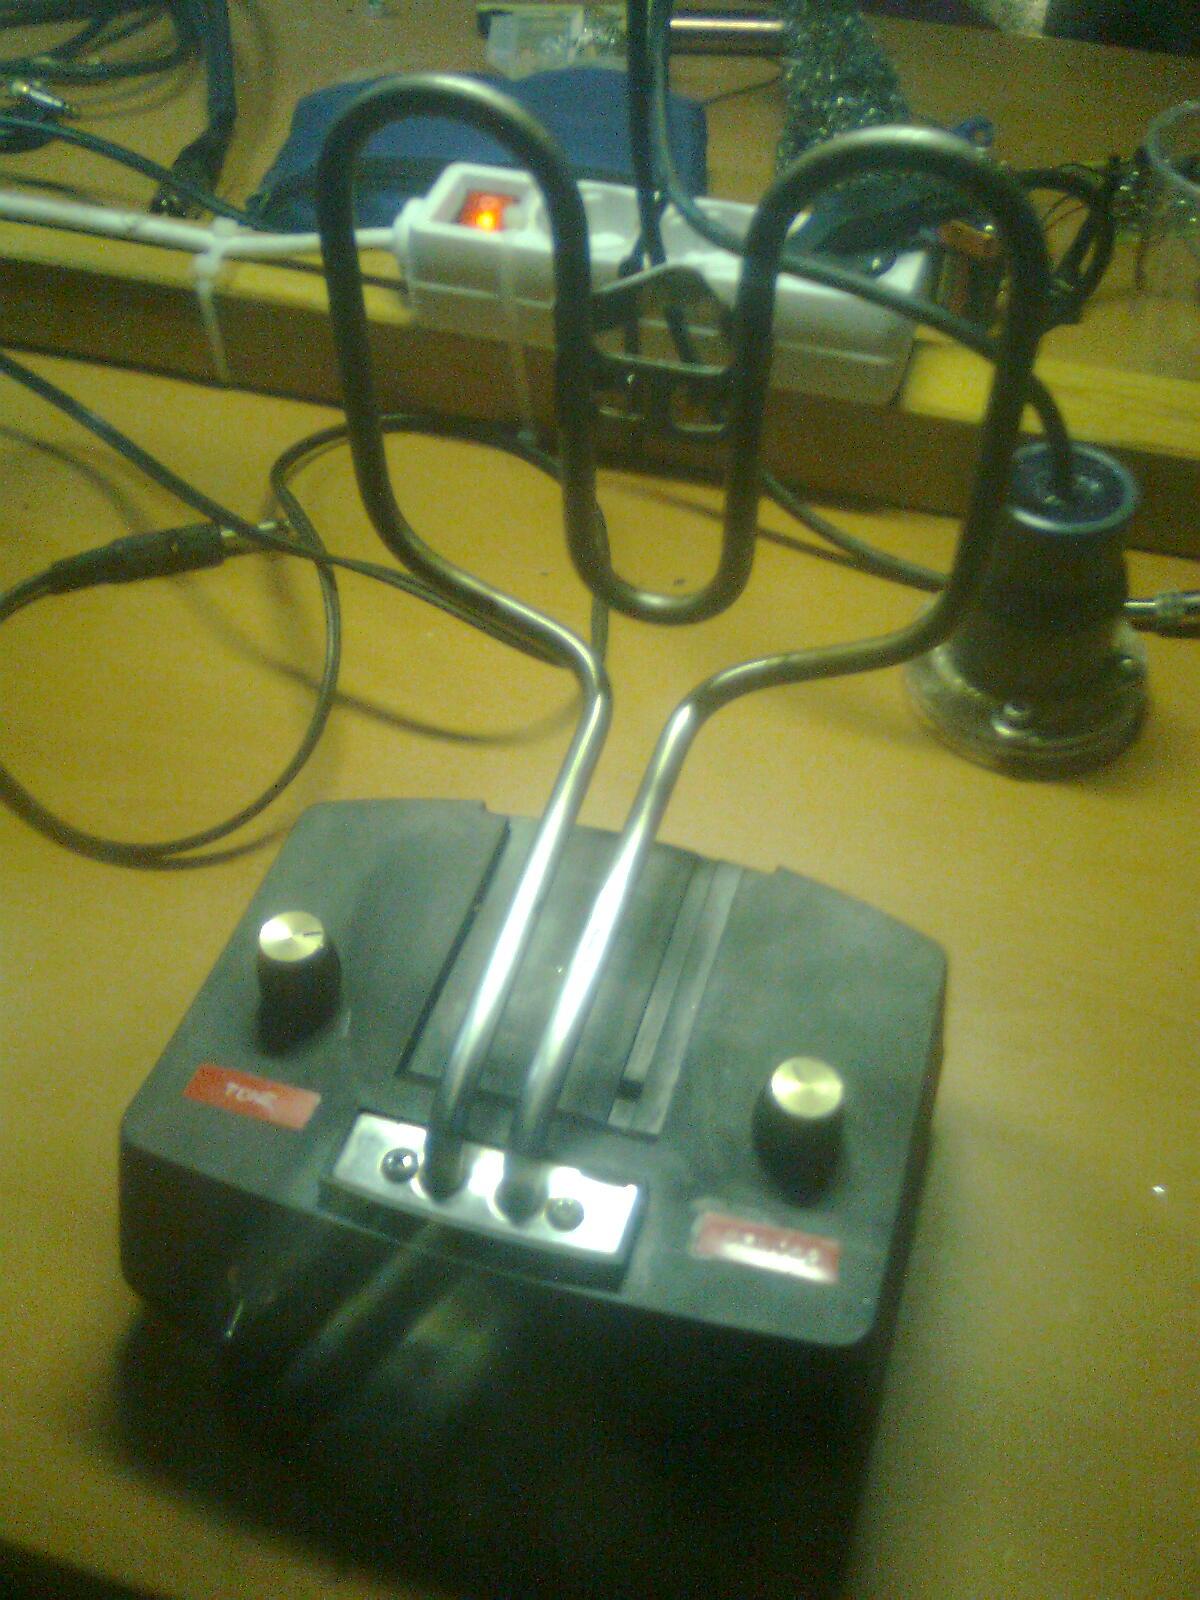 Electronic Jam Circuit